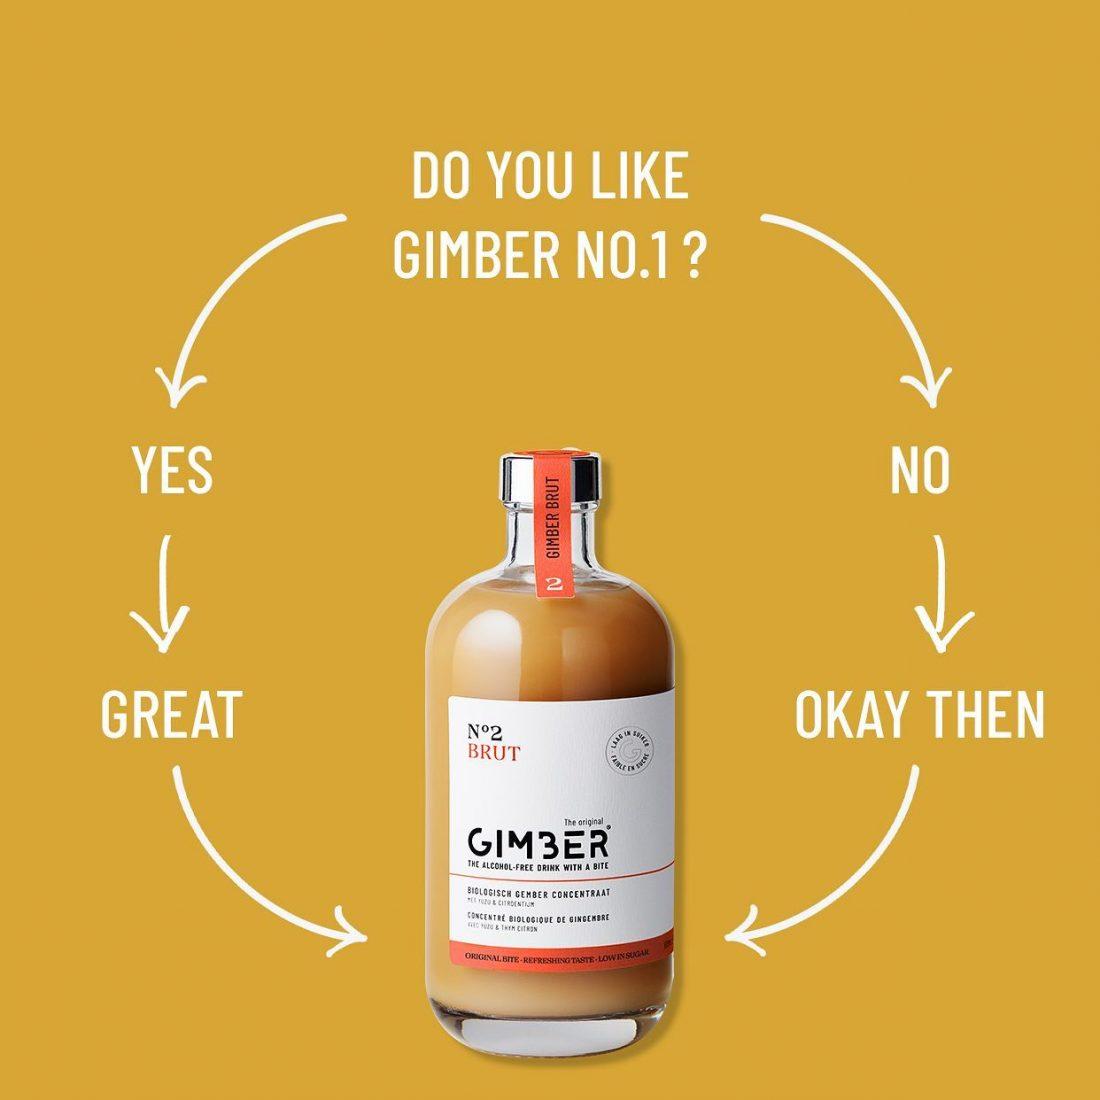 GIMBER N°2 BRUT 500 ml